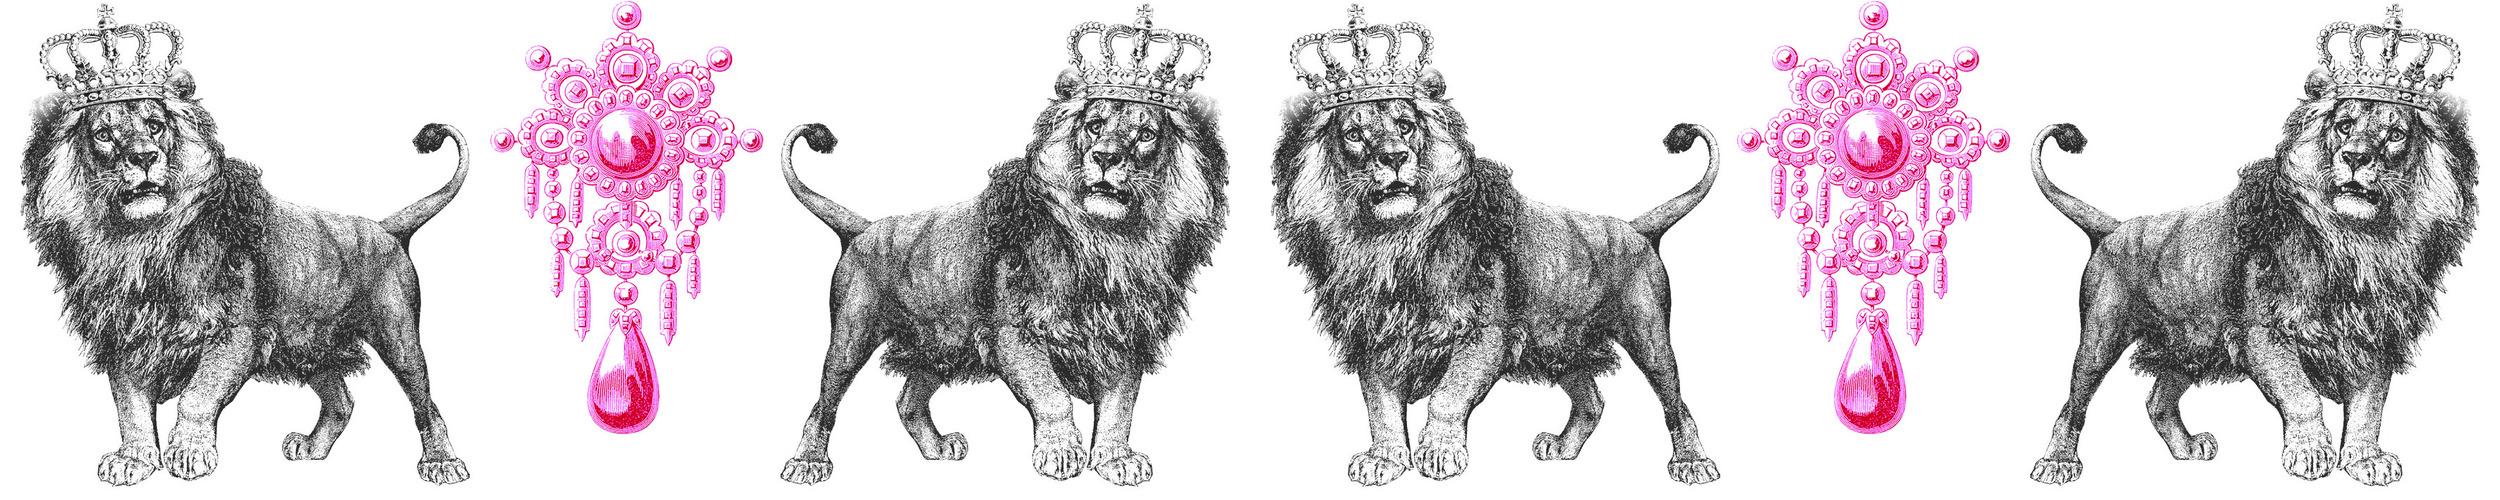 lions and pendants.jpg